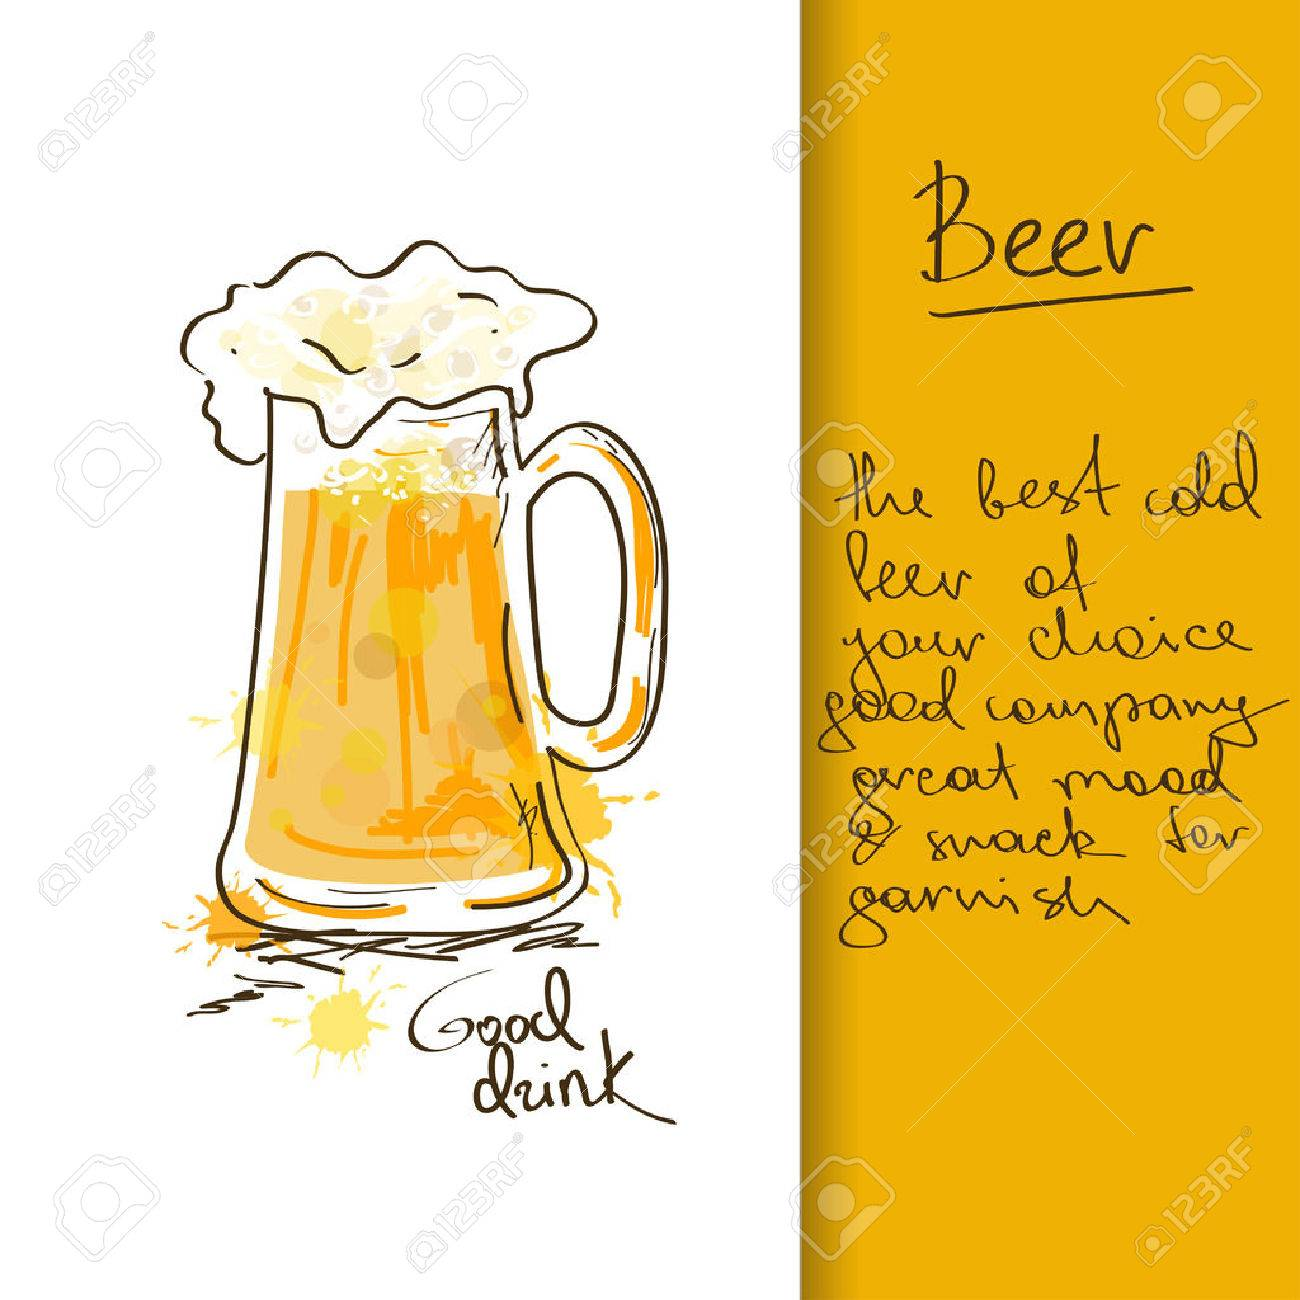 Illustration with hand drawn beer mug Stock Vector - 23503939